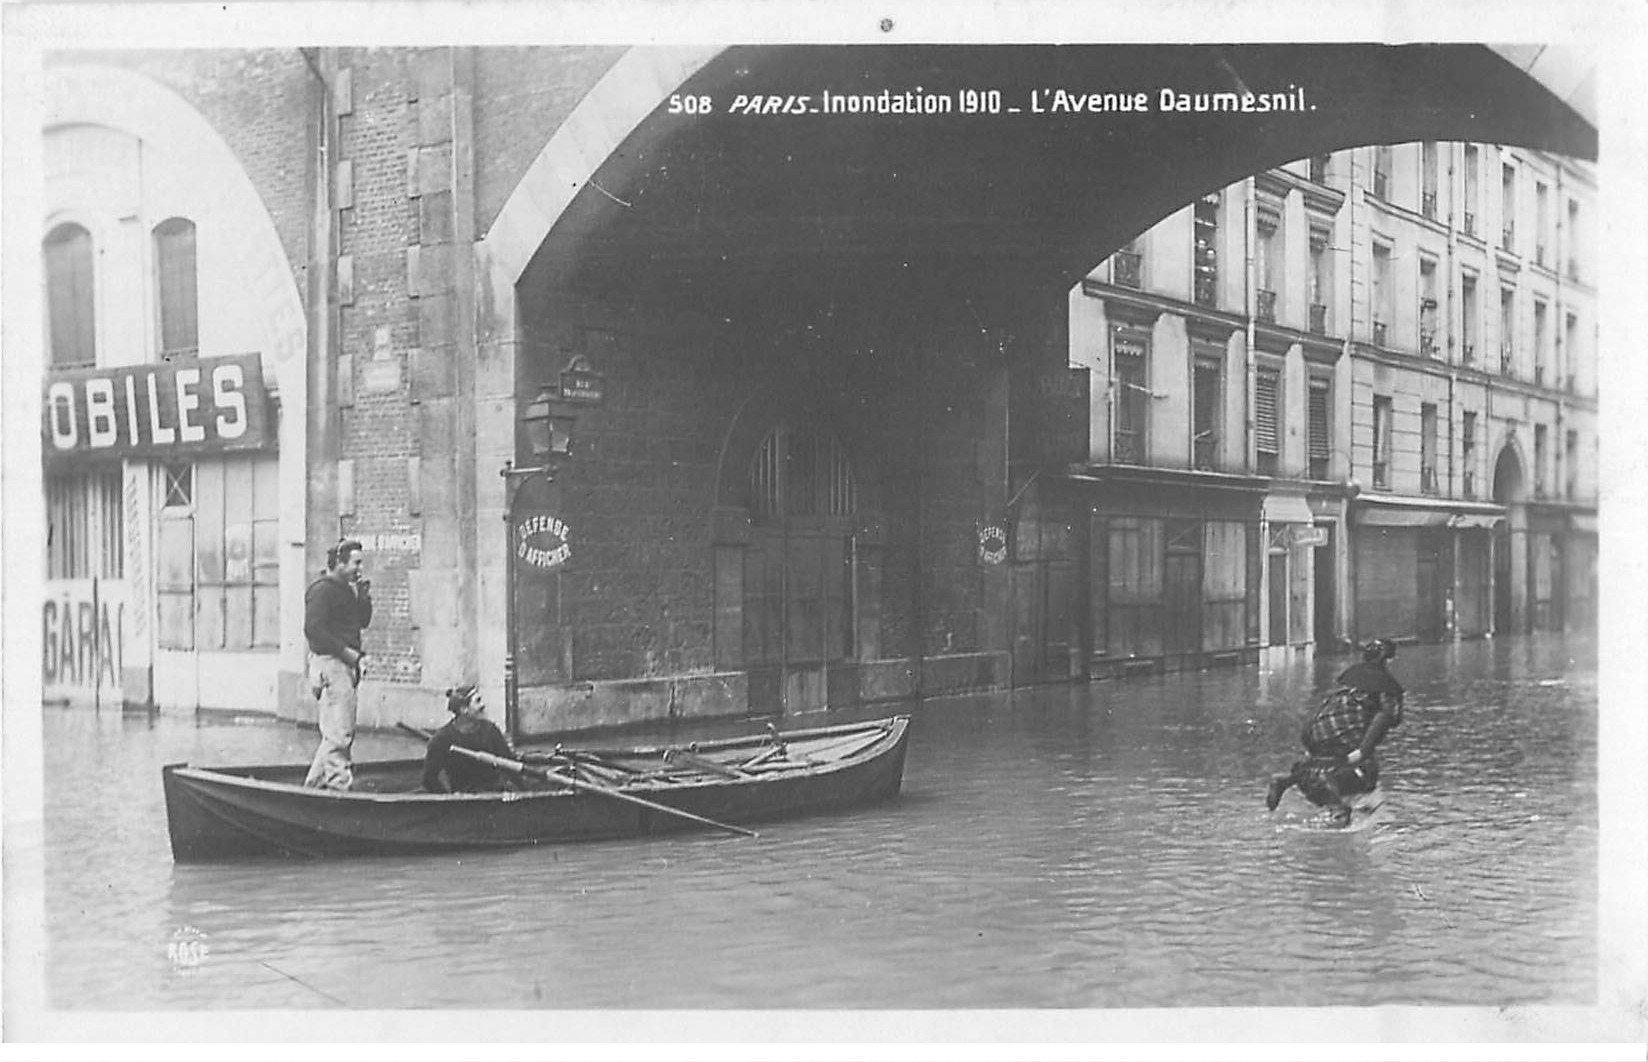 carte postale ancienne Inondation et Crue de PARIS 1910. Avenue Daumesnil. Carte Photo Ed. Rose